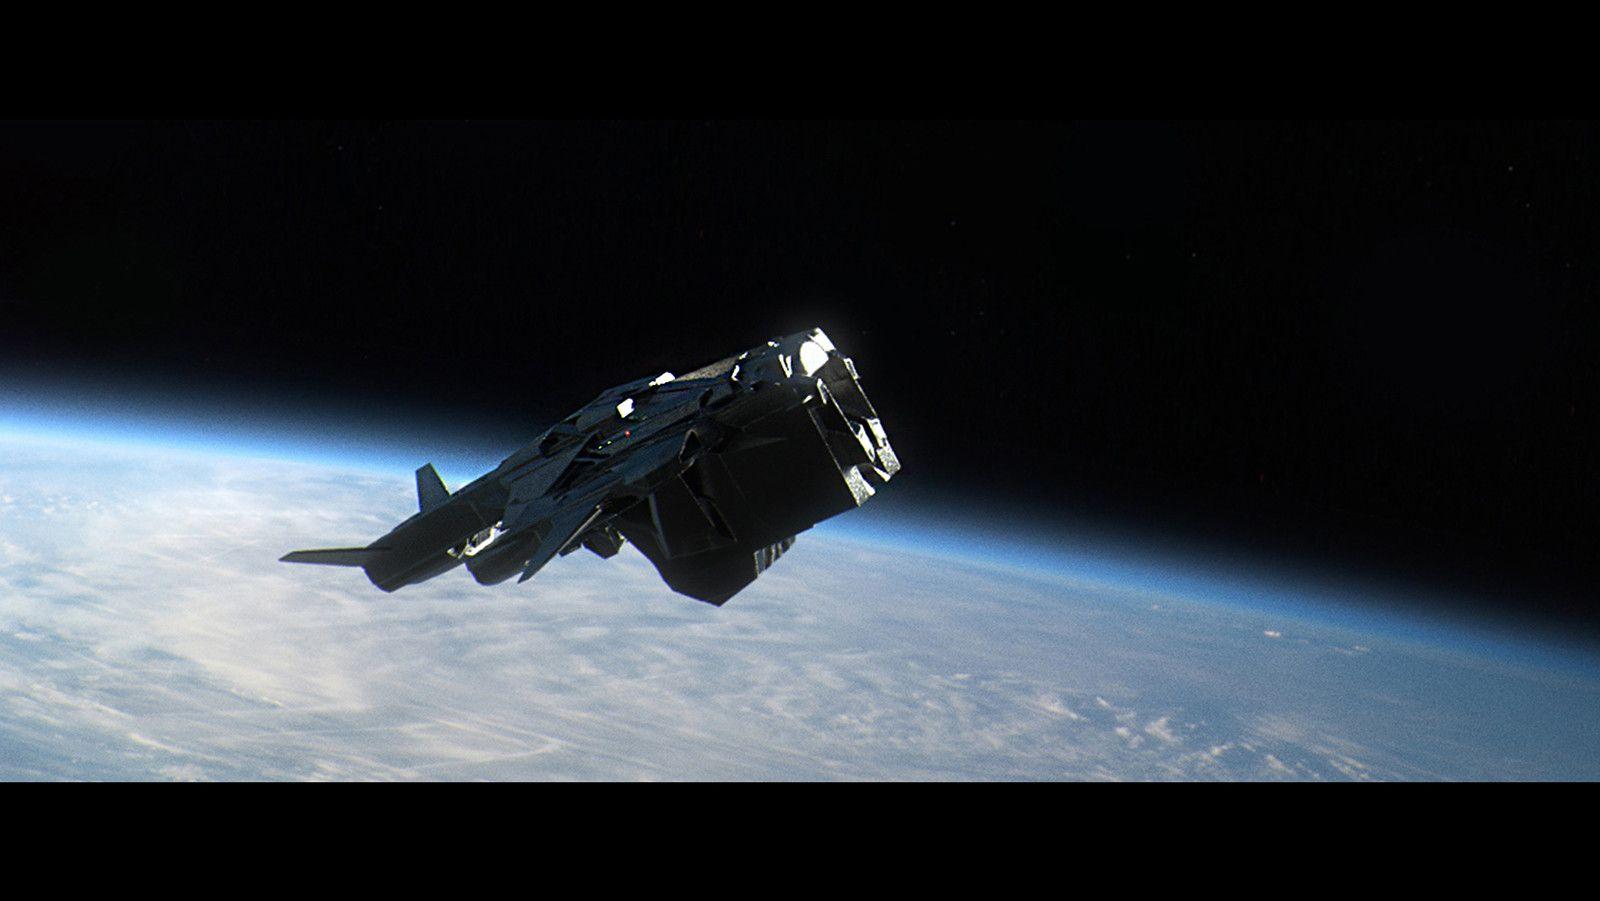 7c7866c4ca58d8e9a5f82f8f359d48bc artstation space adventures, nikolay razuev transhuman space